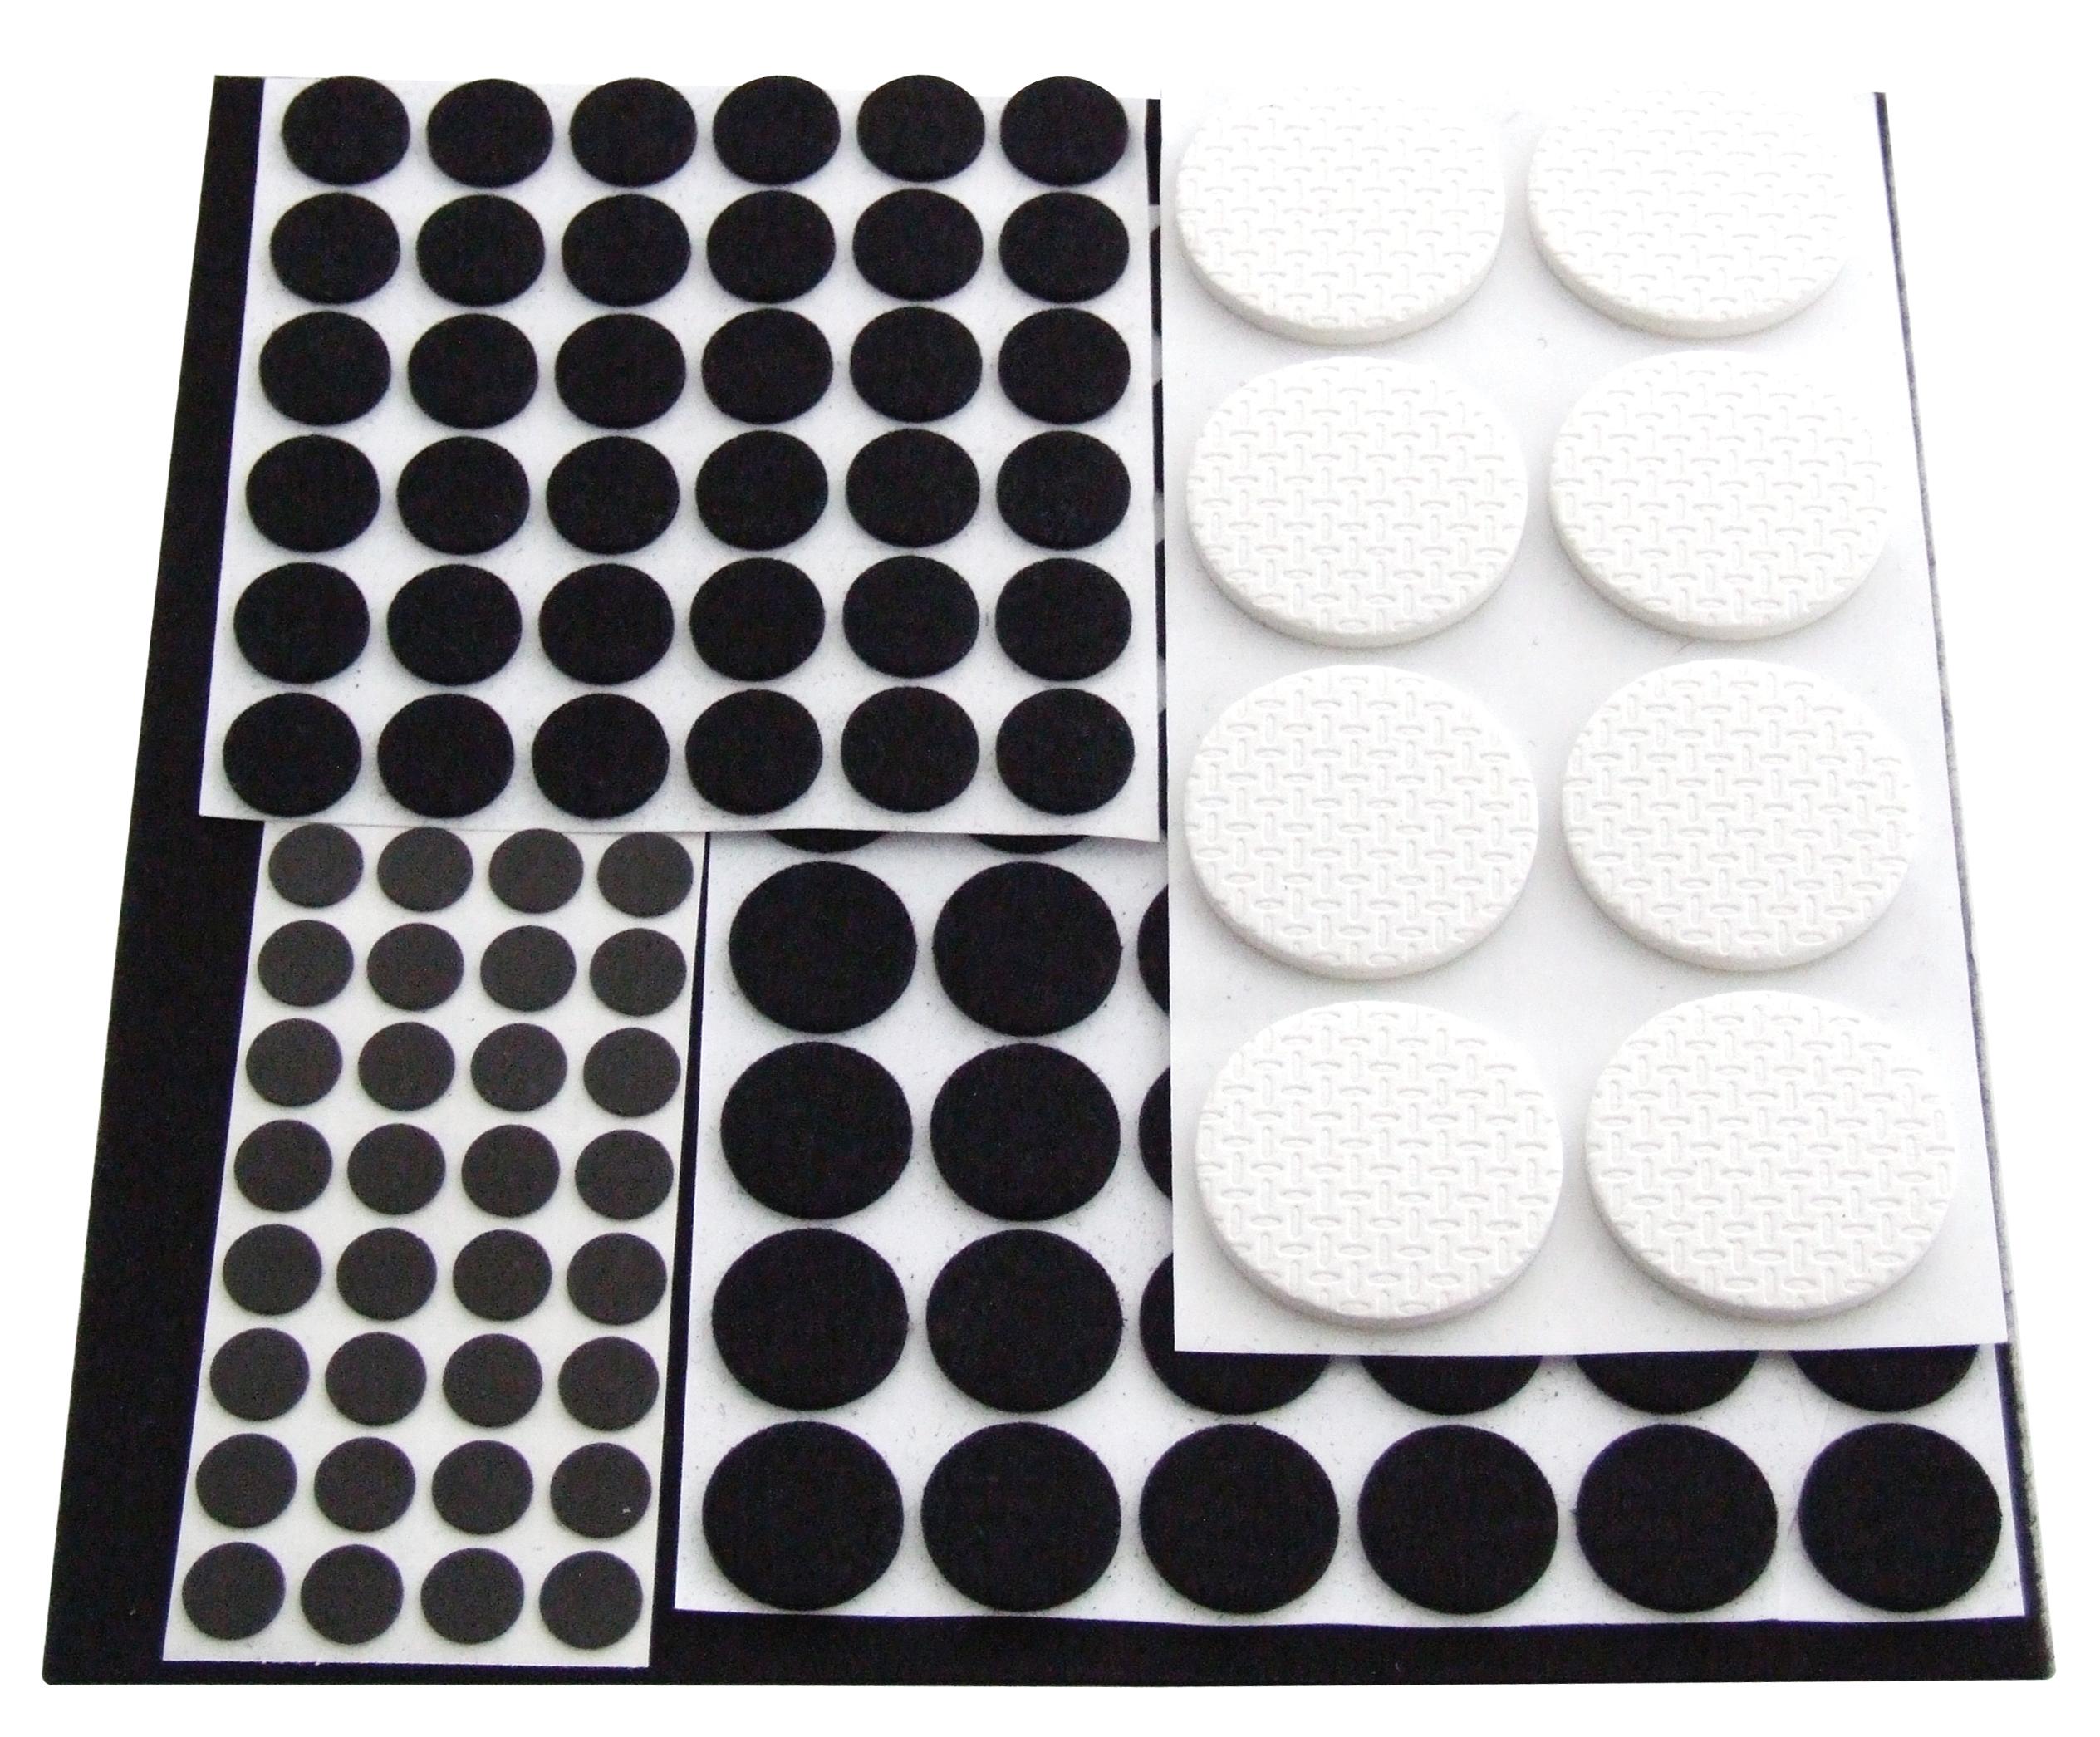 125 Anti Skid Rubber Felt Pads Furniture Protector Feet Multi Surface Wood Metal Ebay